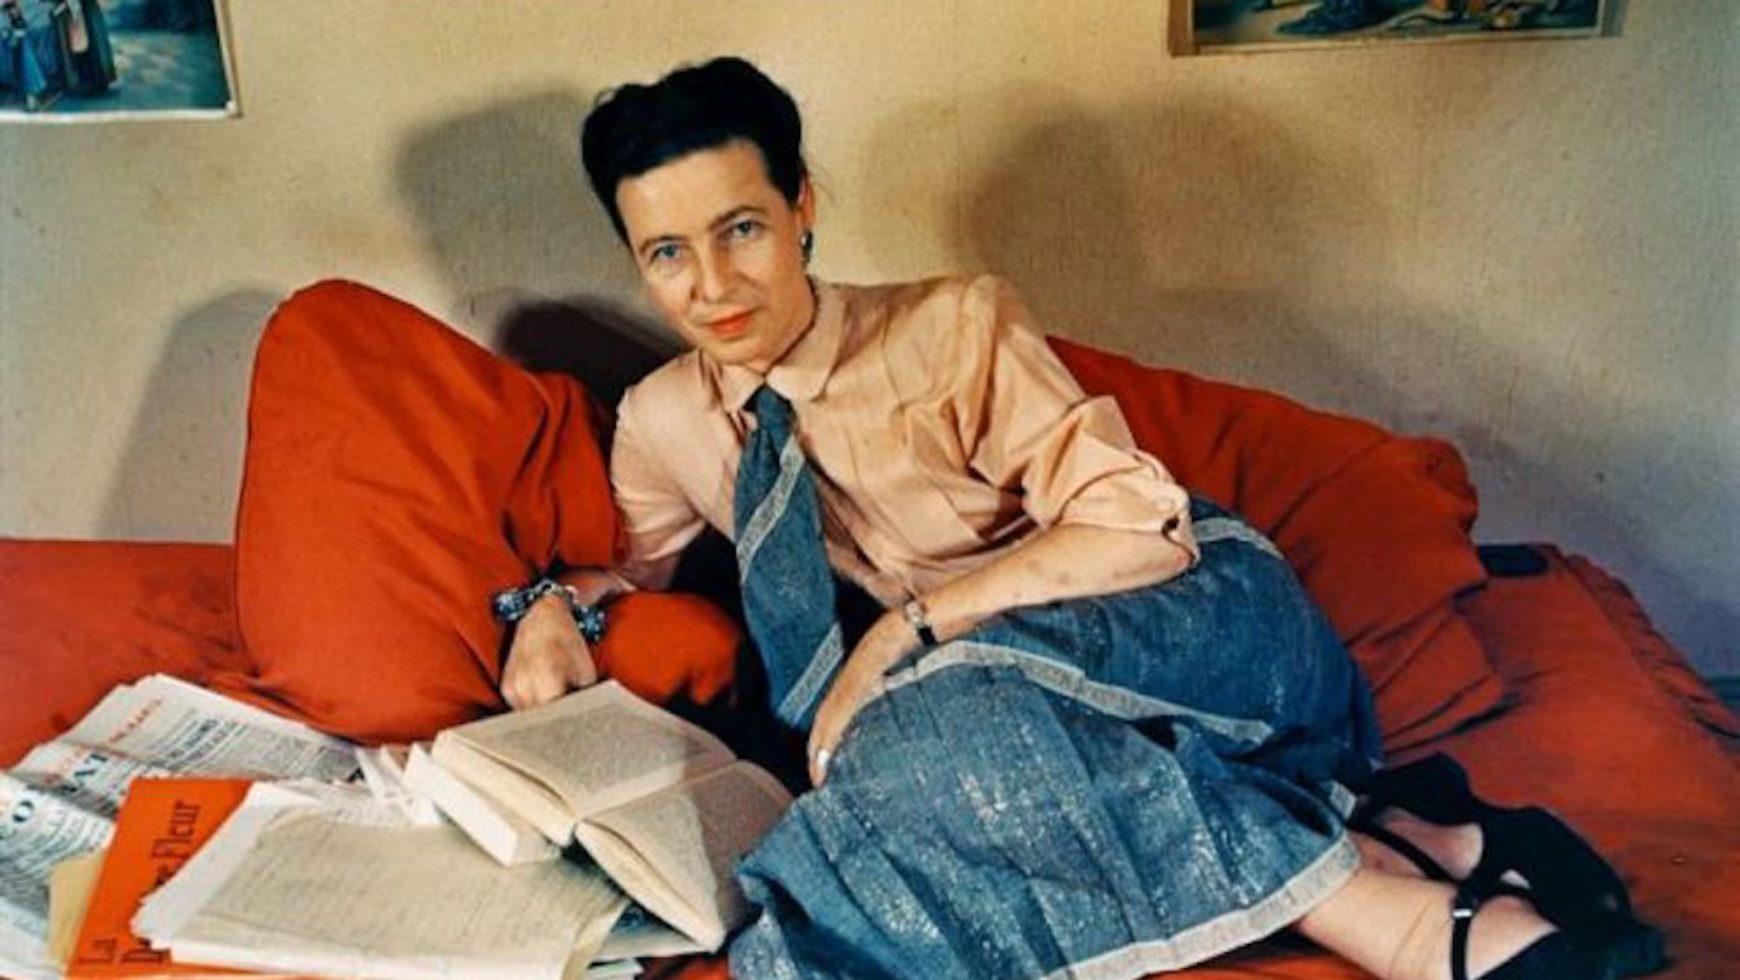 Simone de Beauvoir Is The Badass Inspiration You Need To Keep Going